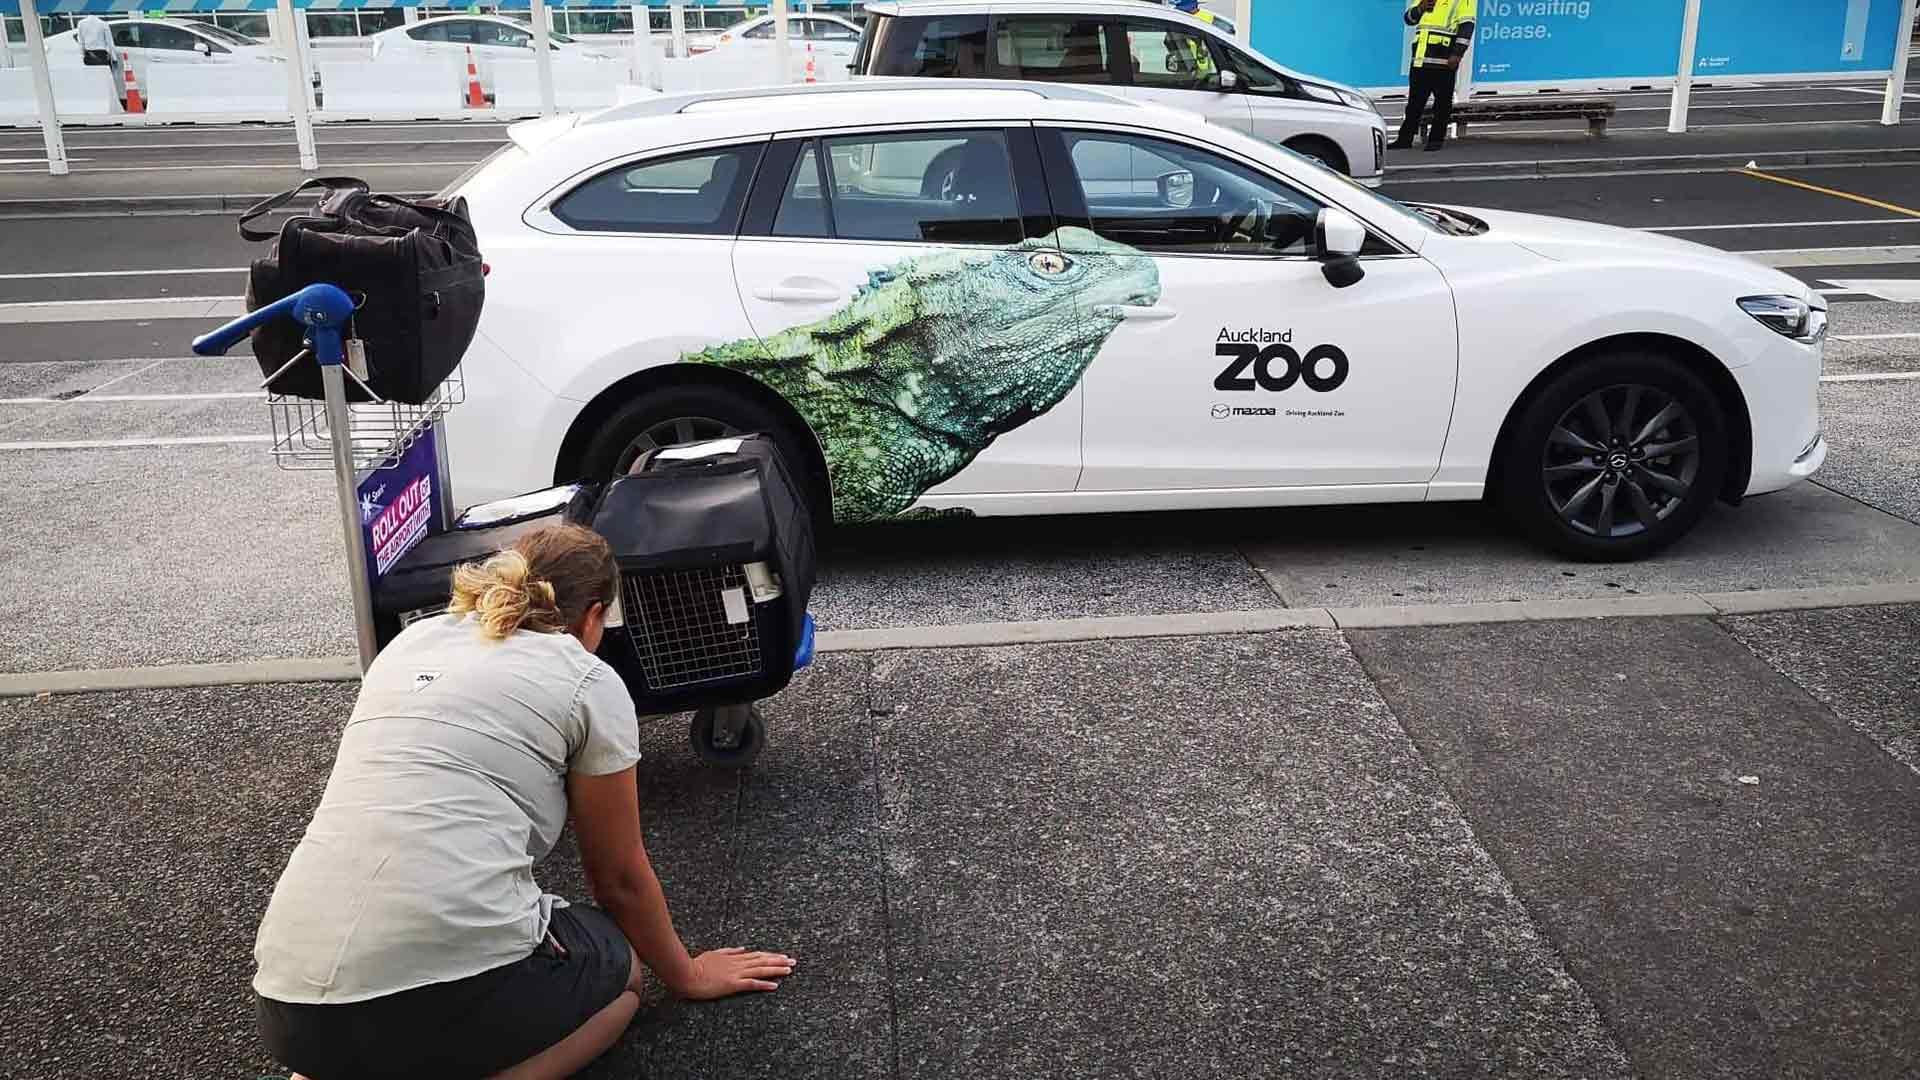 https://rfacdn.nz/zoo/assets/media/gallery-1-for-flying-home.jpg